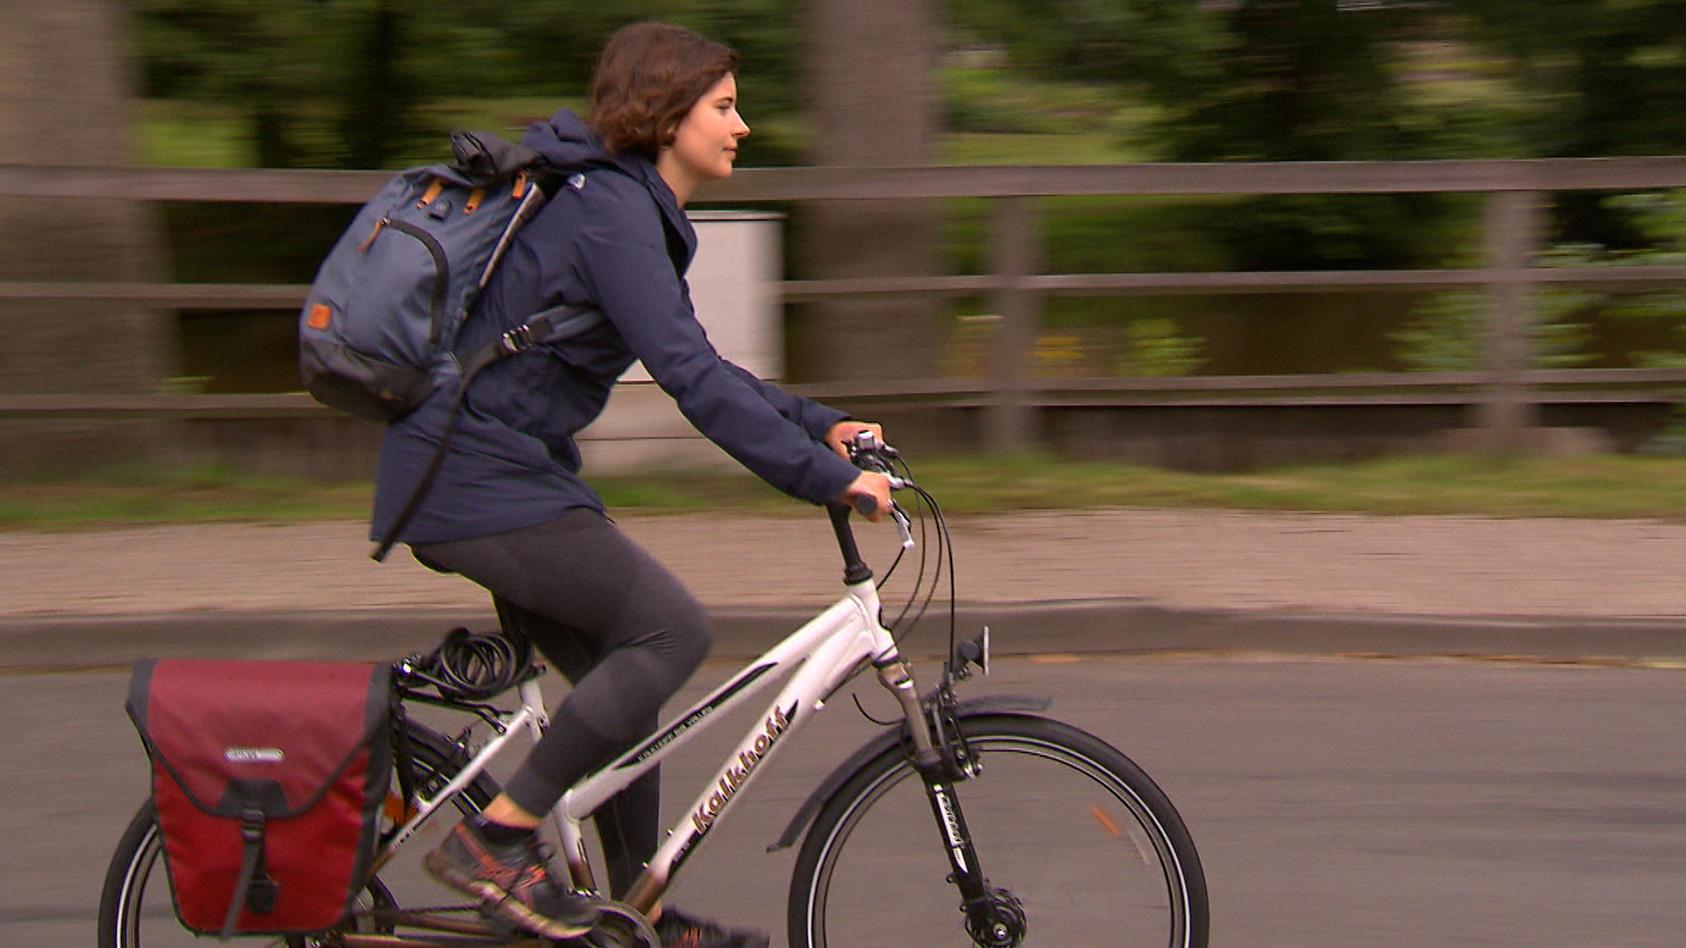 RTL Reporterin Luisa Ziegler auf Fahrradtour